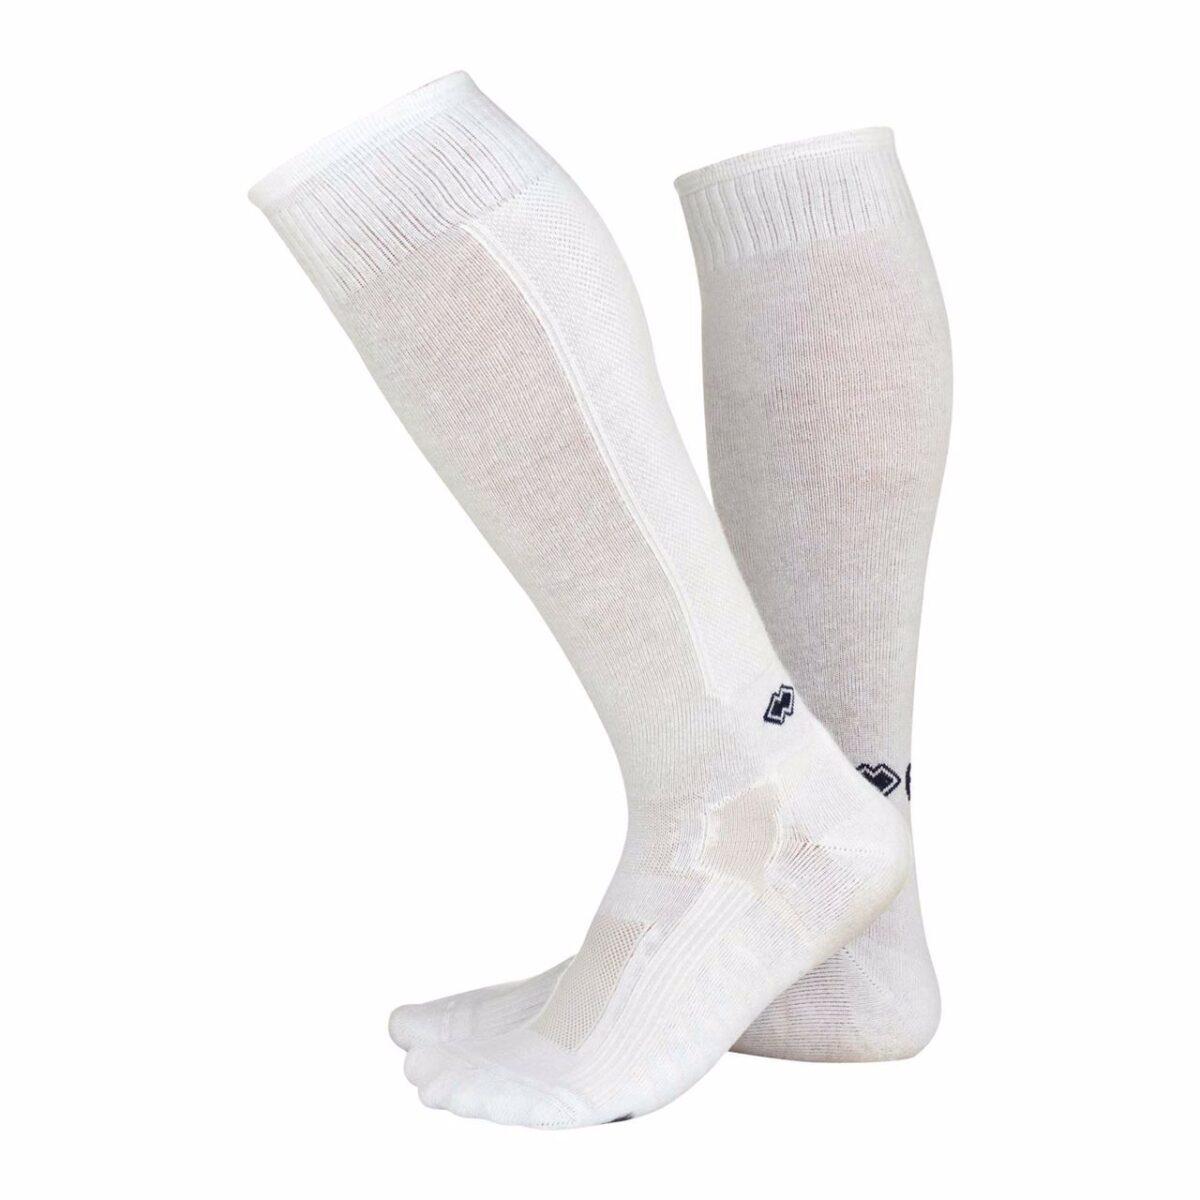 Errea ACTIVE Socks - junior